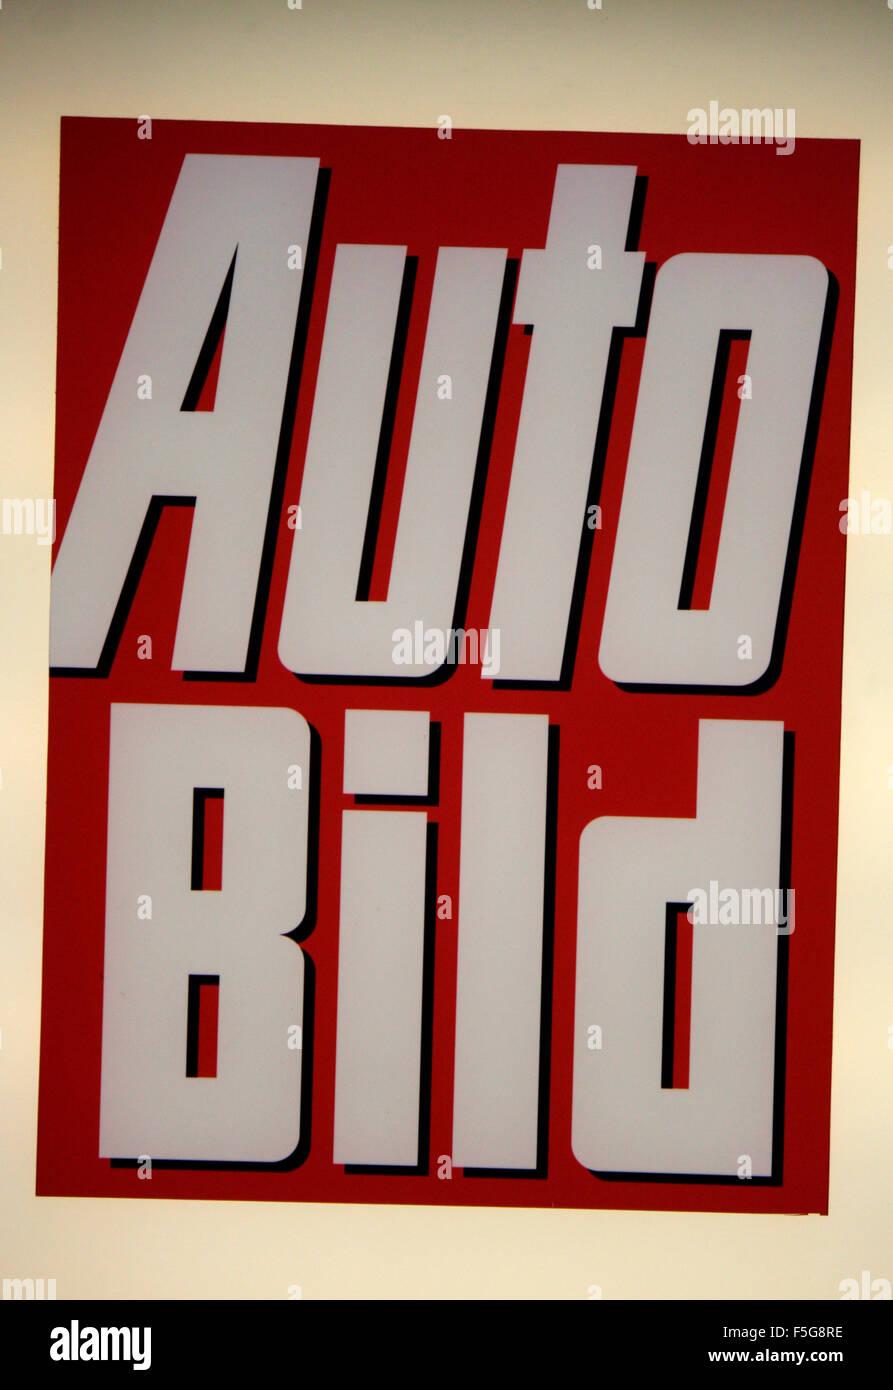 Markenname: 'Auto Bild', Berlin. - Stock Image